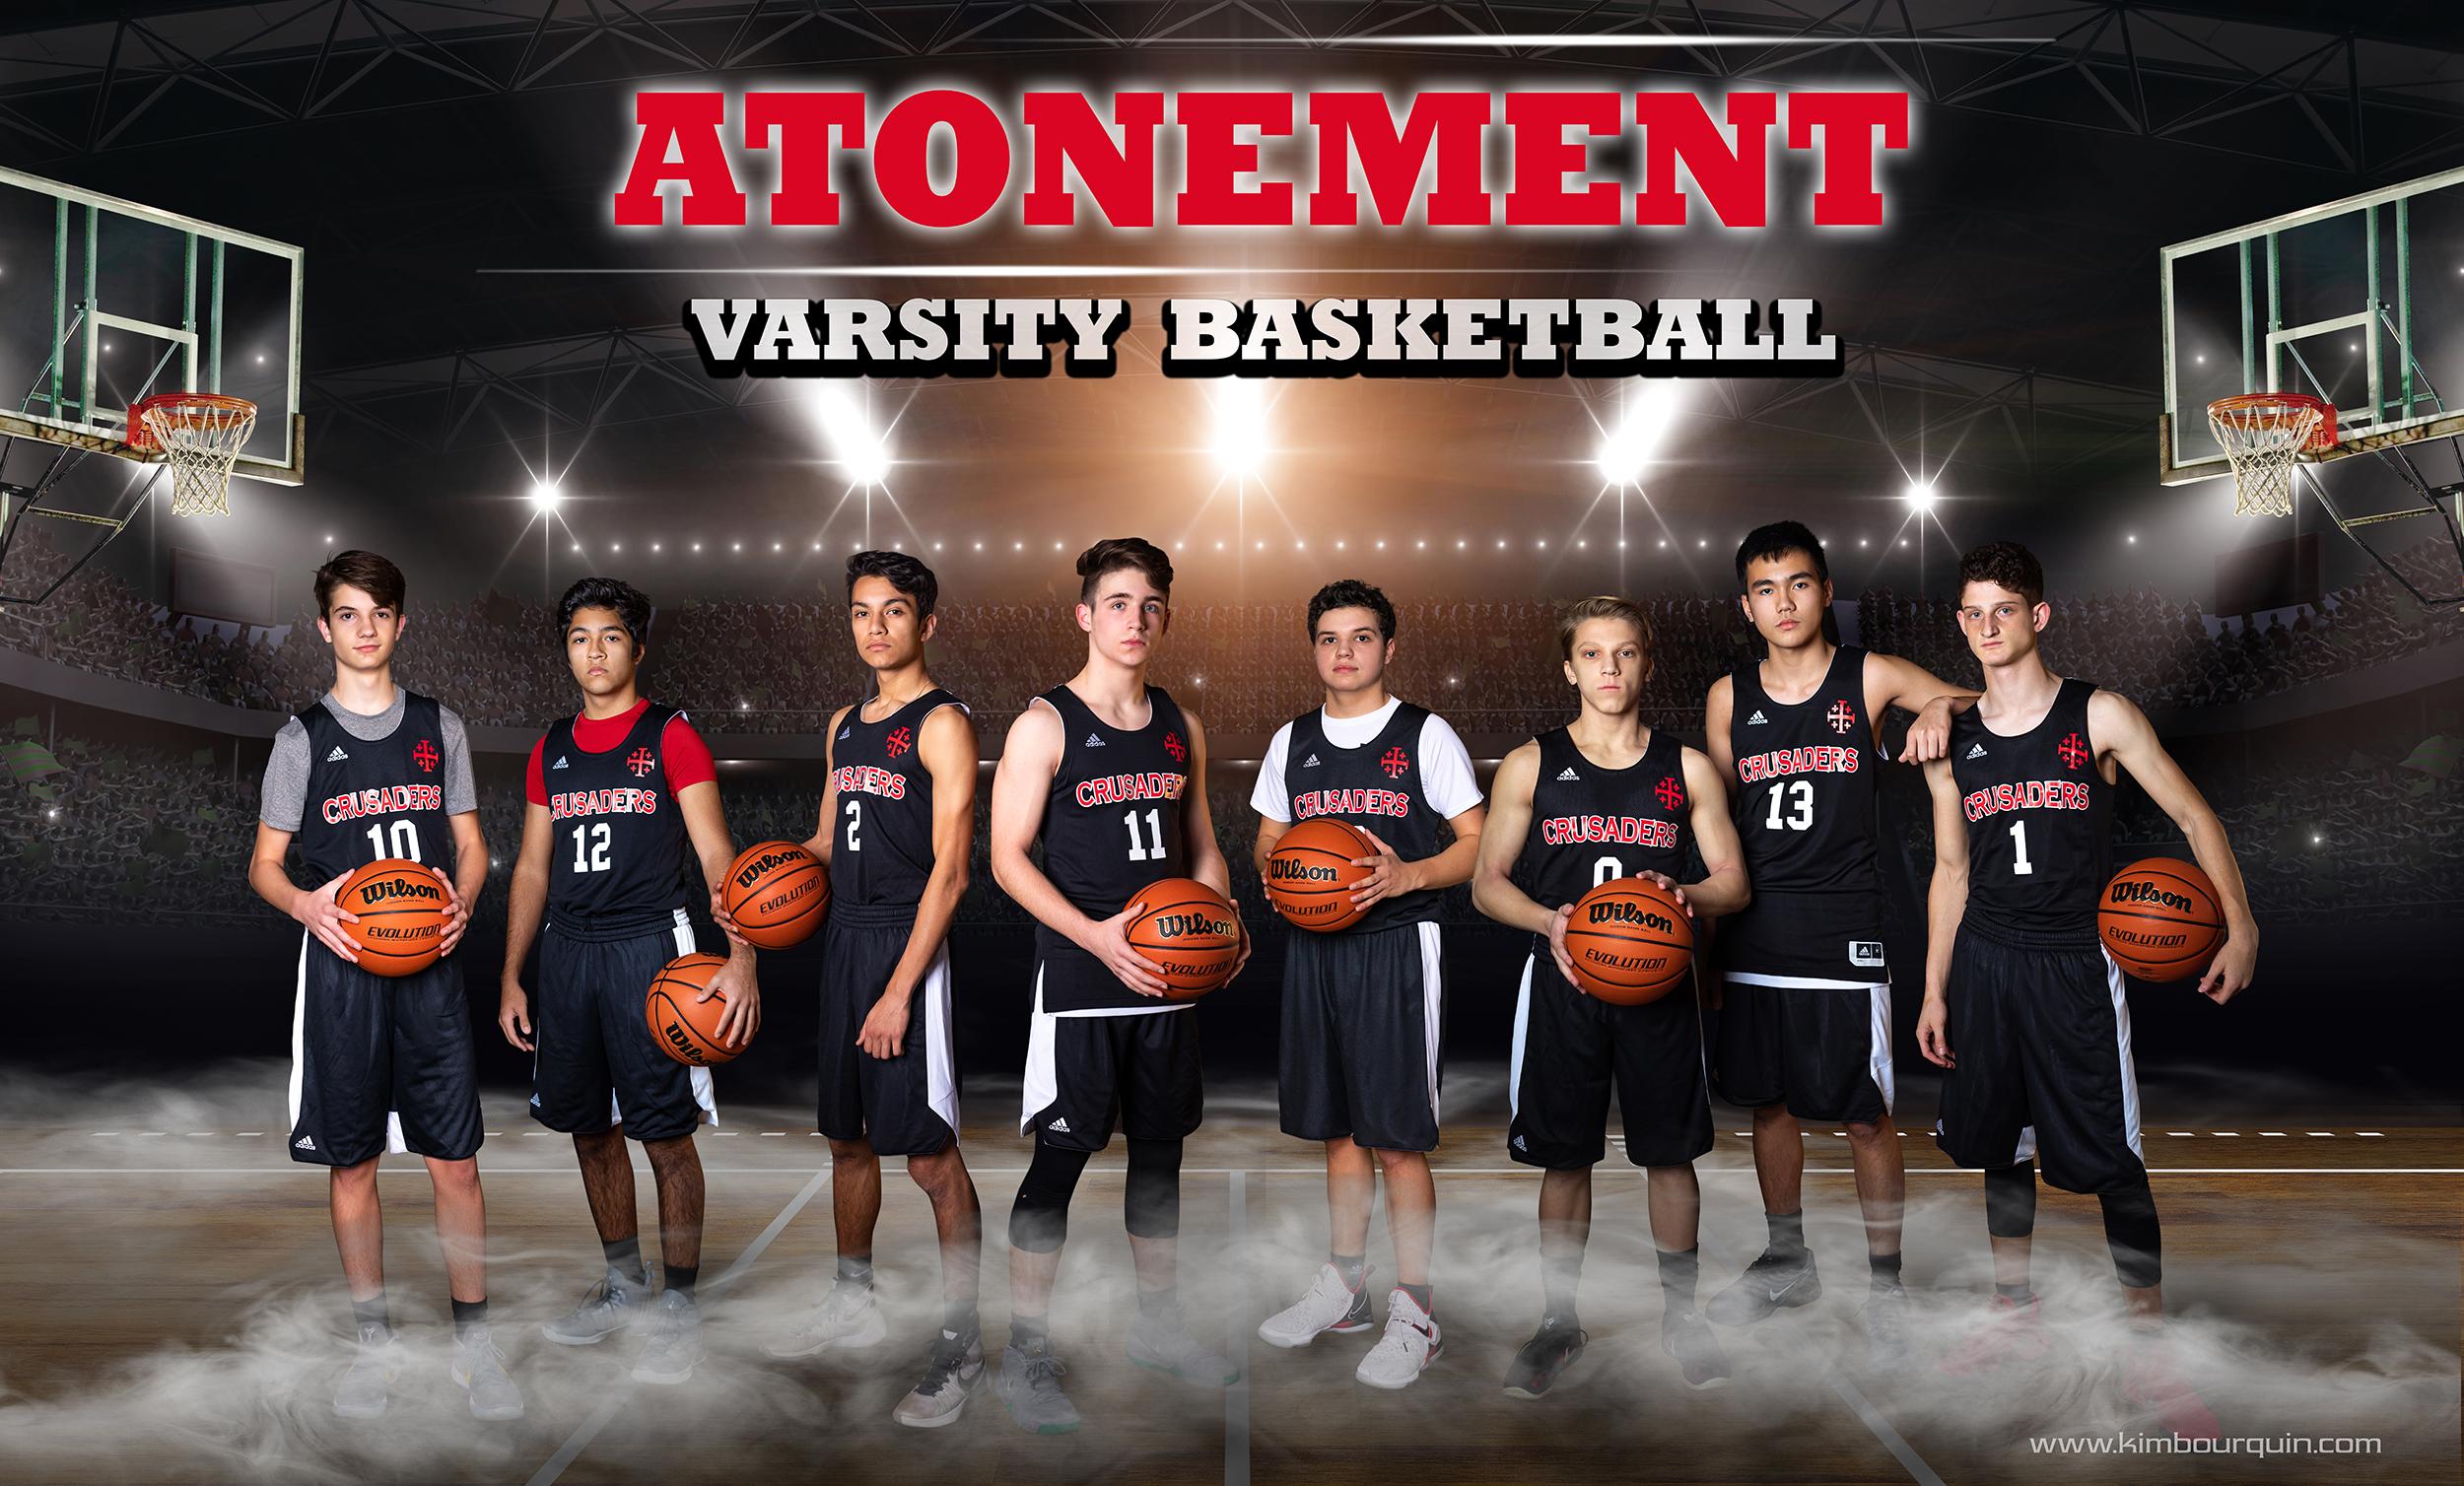 Boys-basketball-atonement-composite-banner.jpg